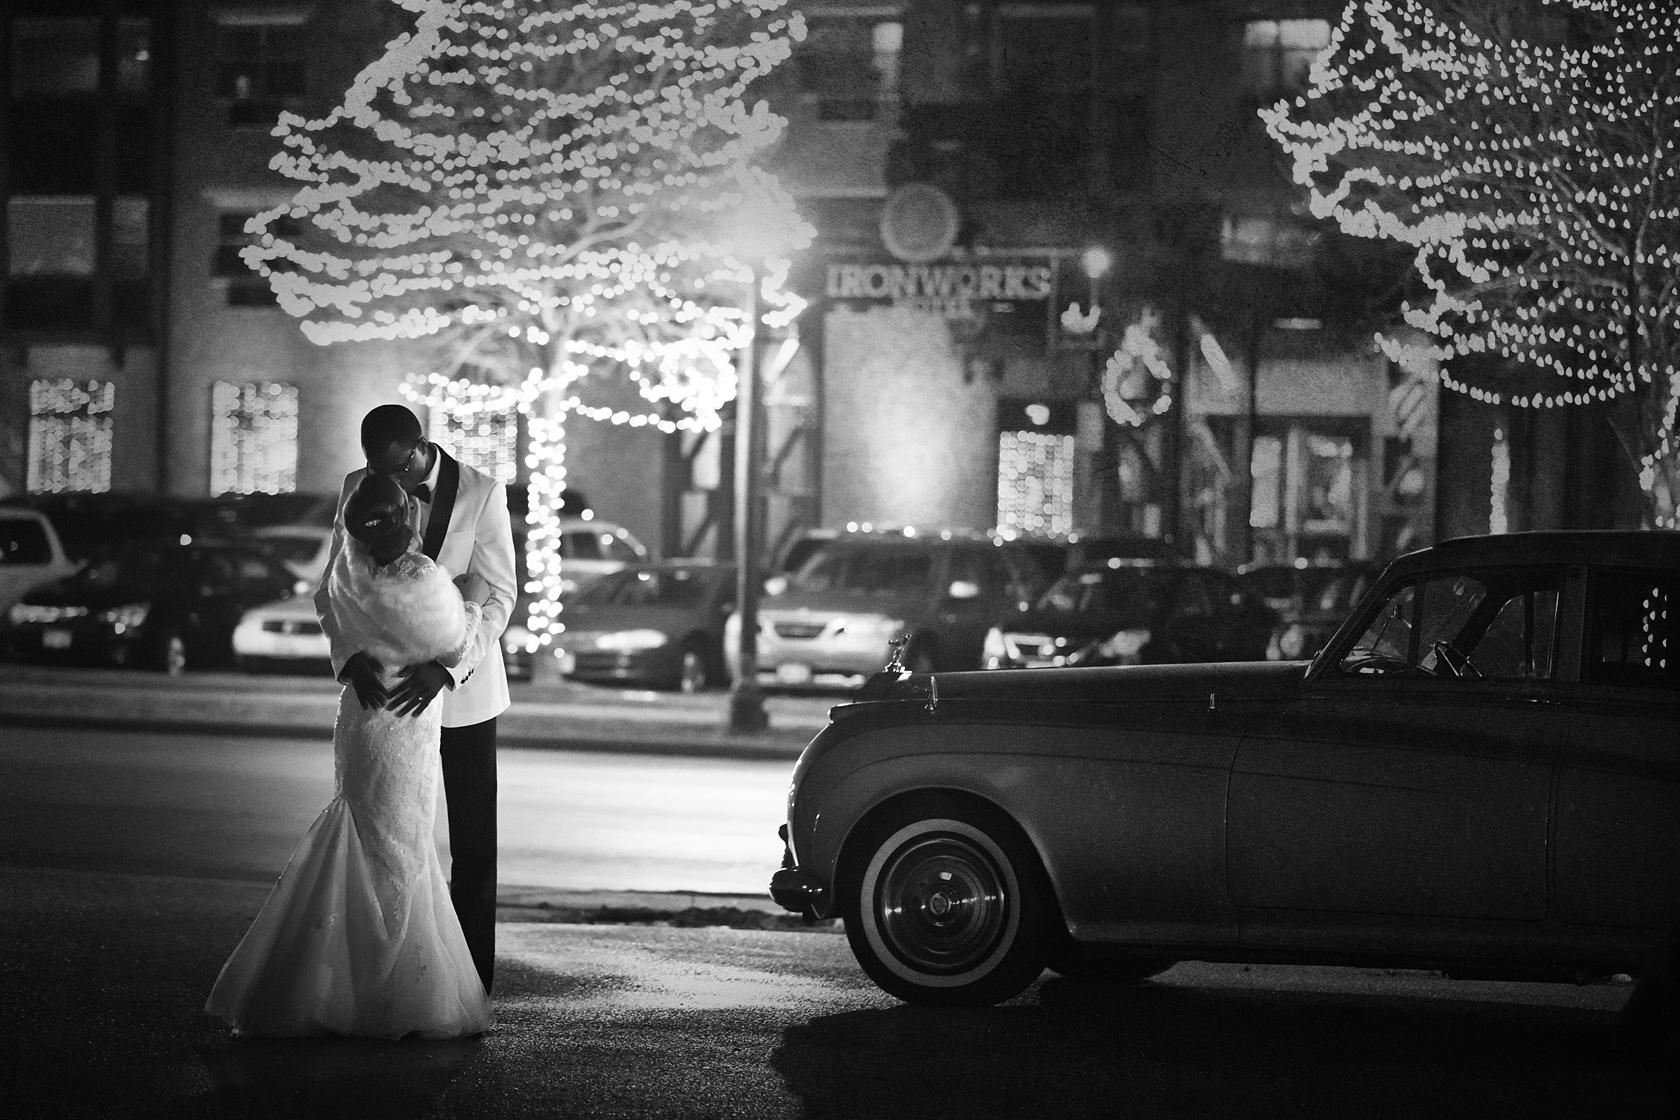 Beloit_wedding_photographer_ironworks_hotel_hendricks_commercial_properties.jpg